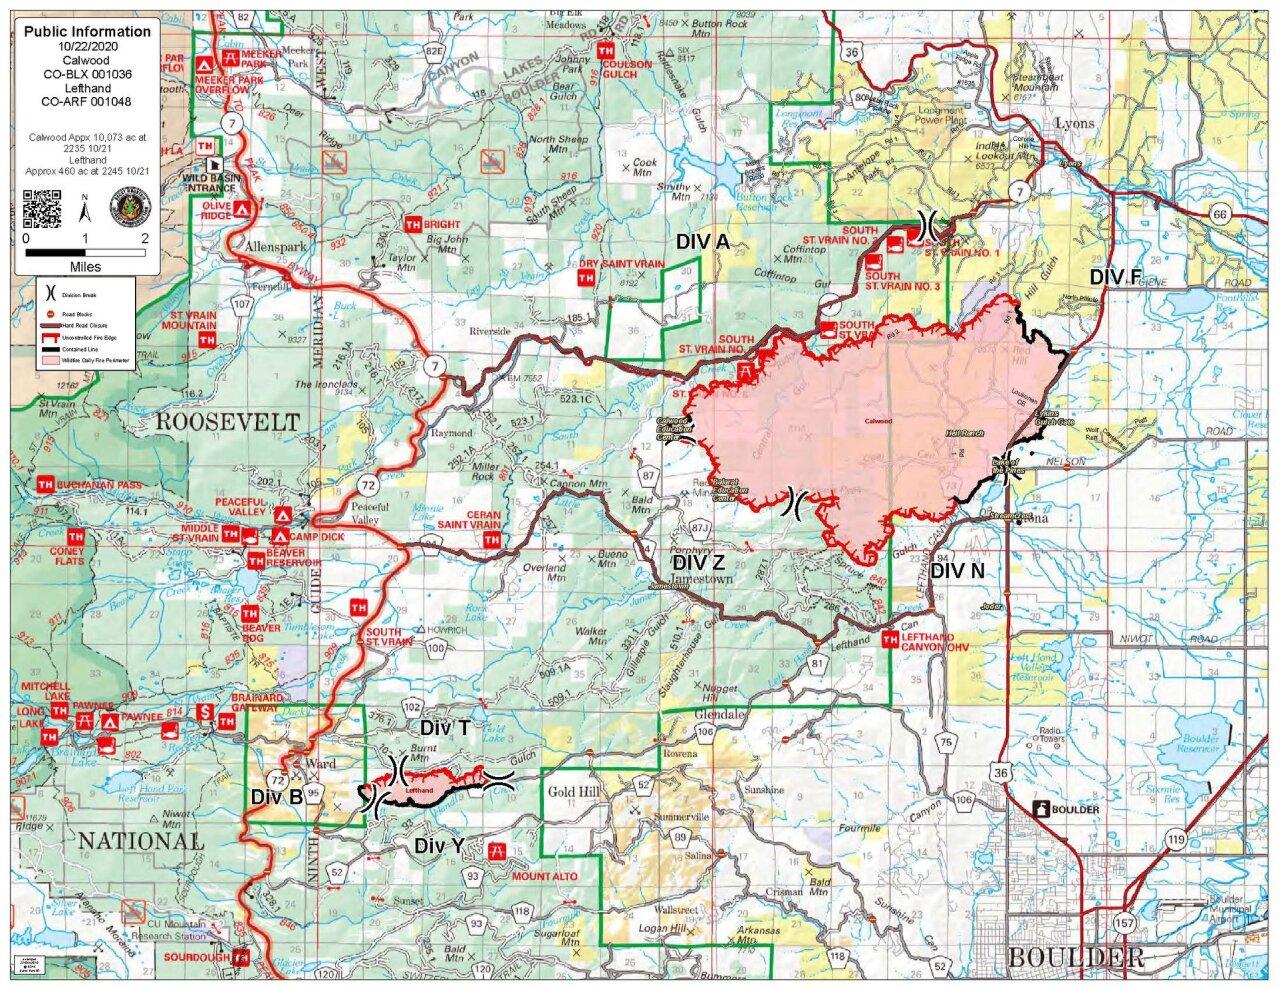 10-22-20 calwood lefthand map.jpg